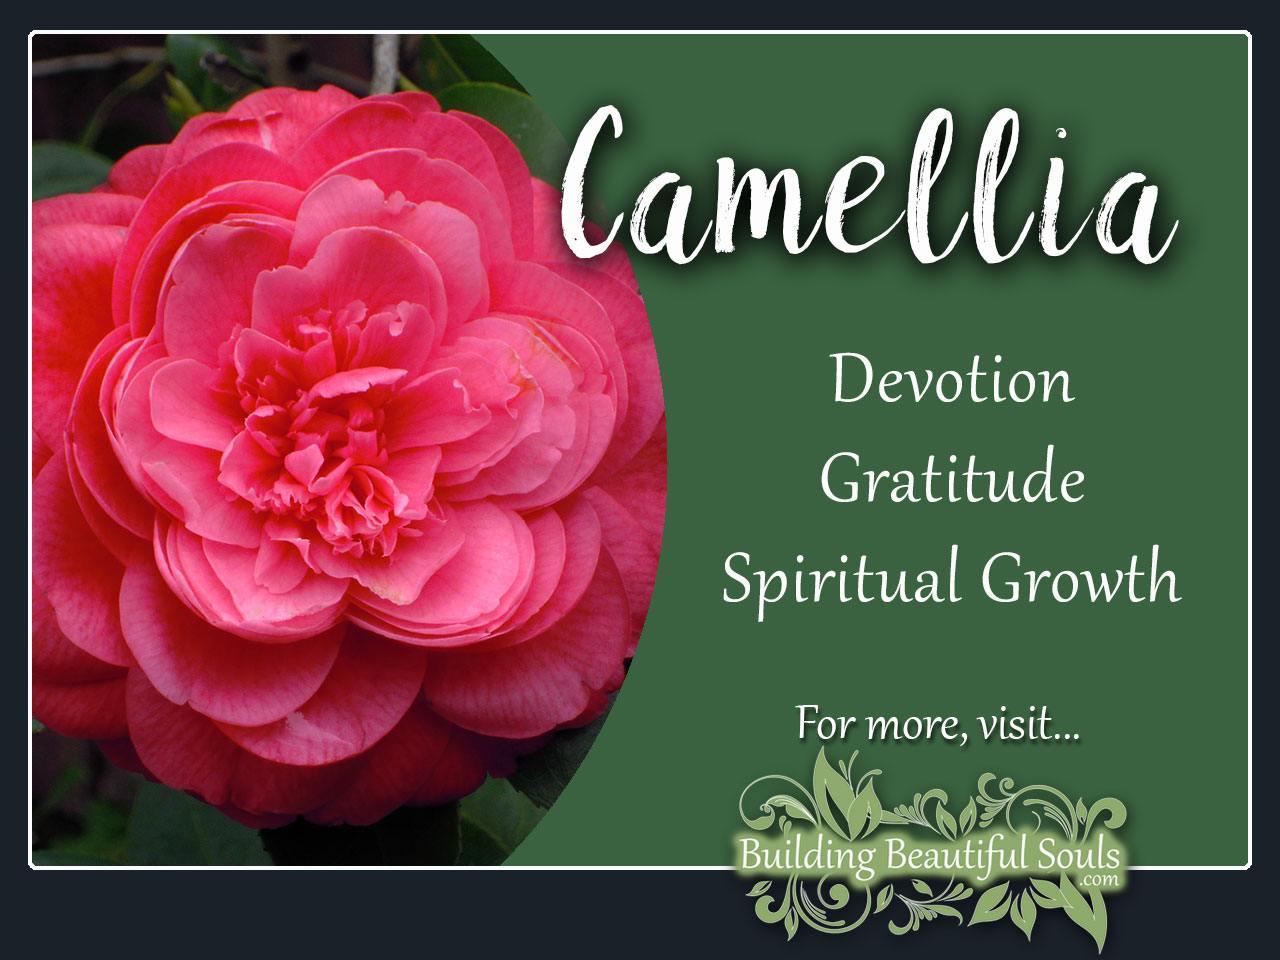 camellia meaning symbolism flower